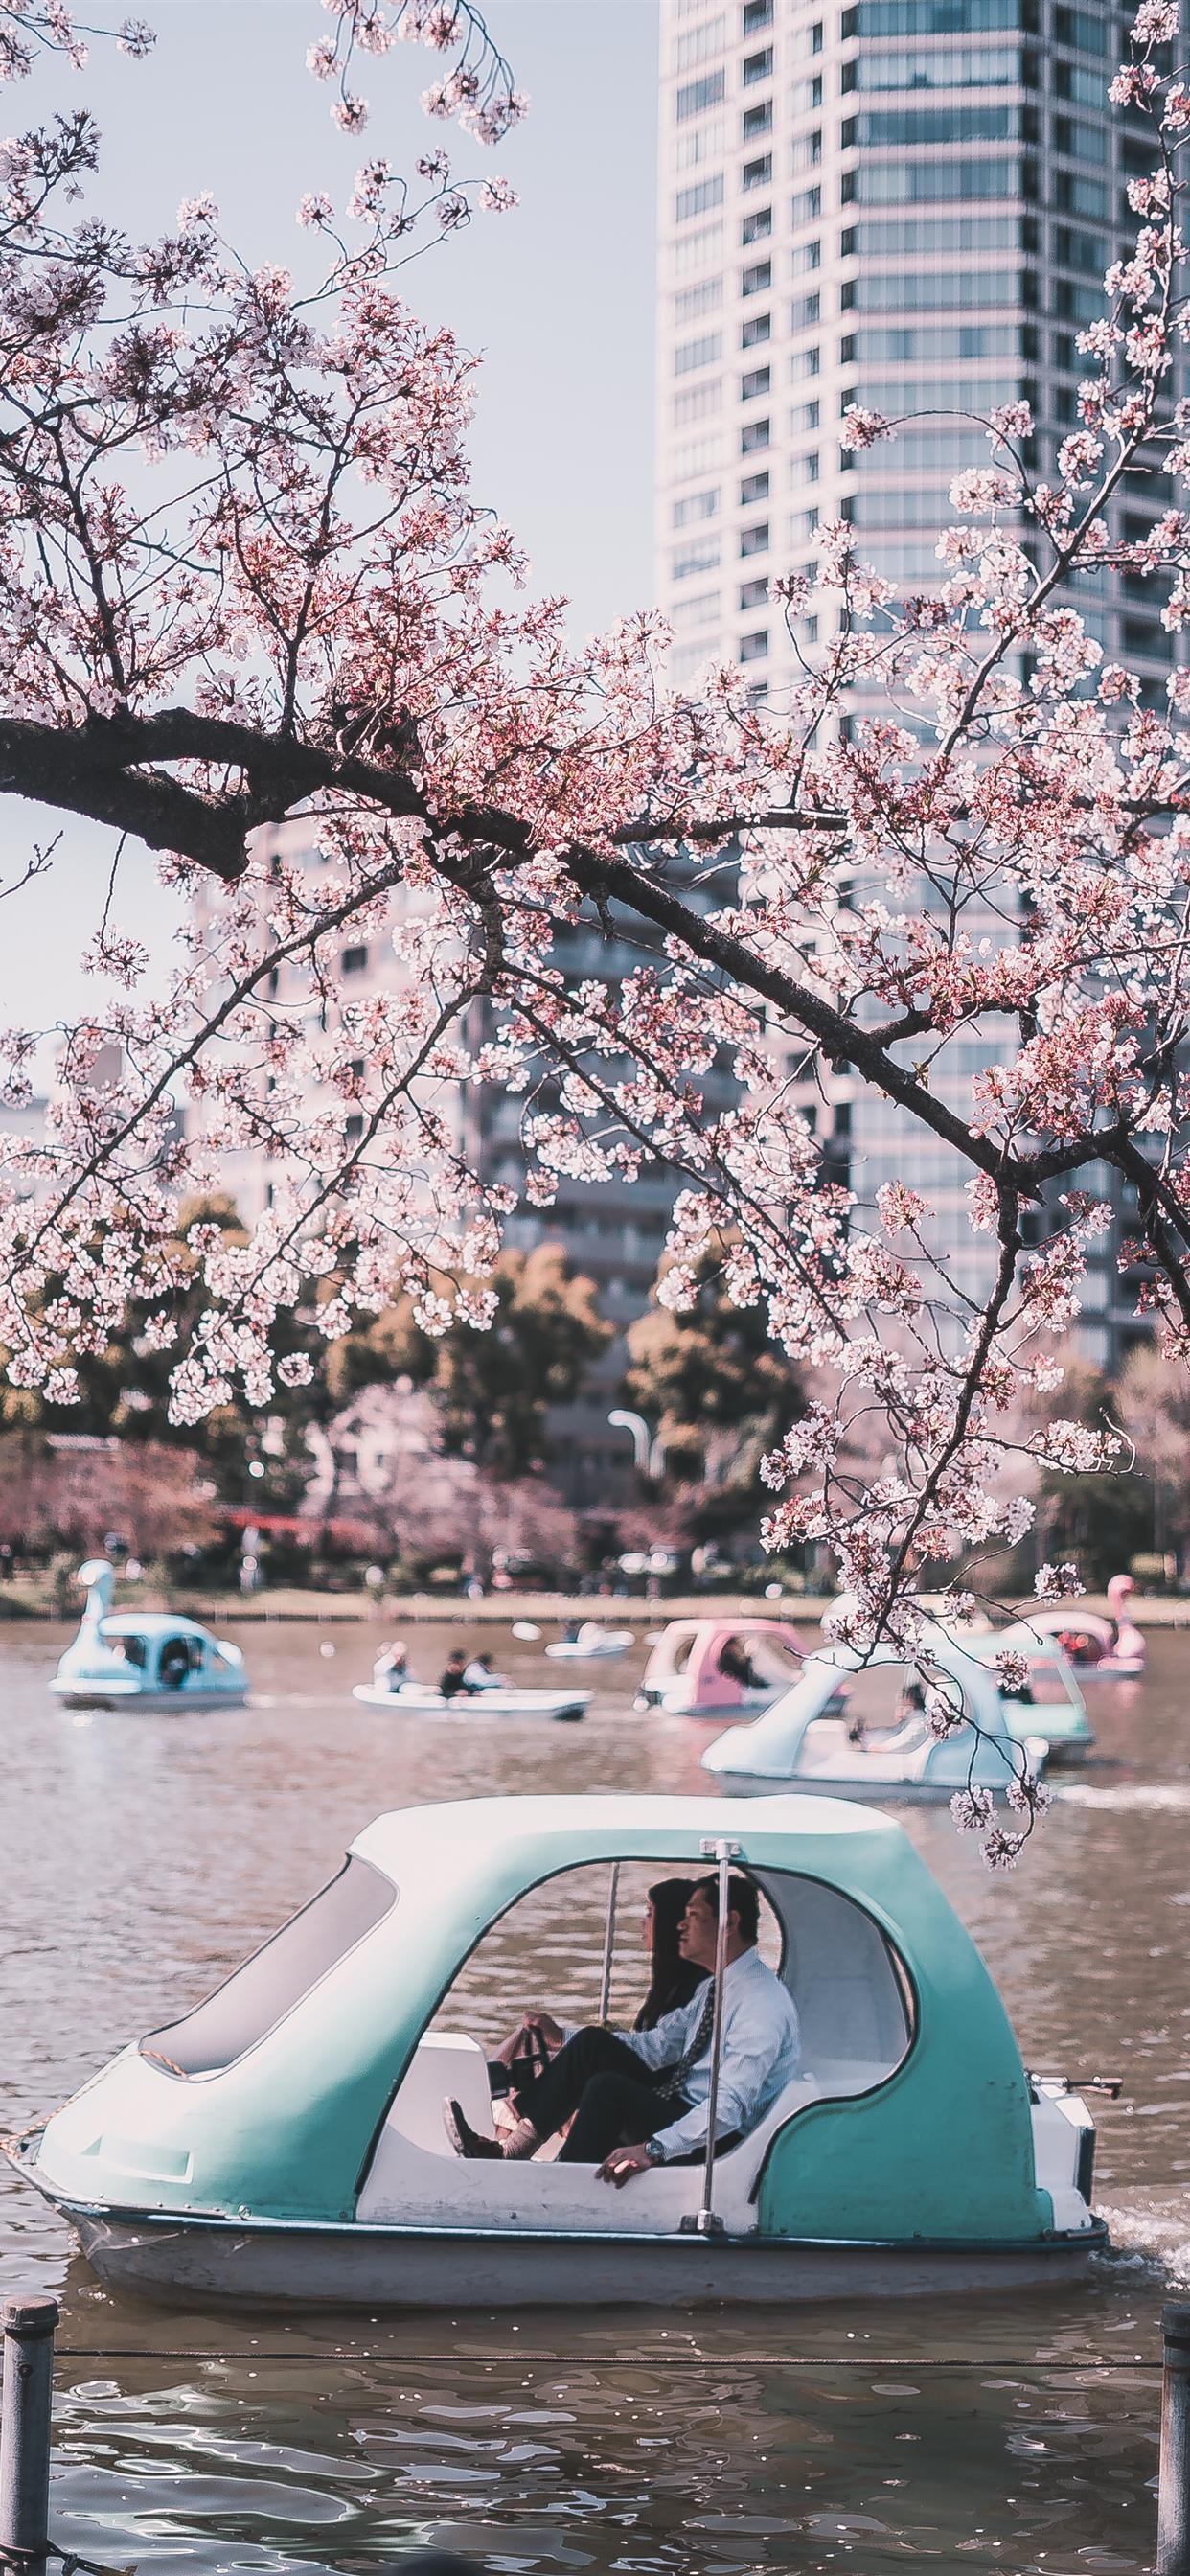 Ueno Park Tokyo Japan Iphone X Wallpapers Free Download